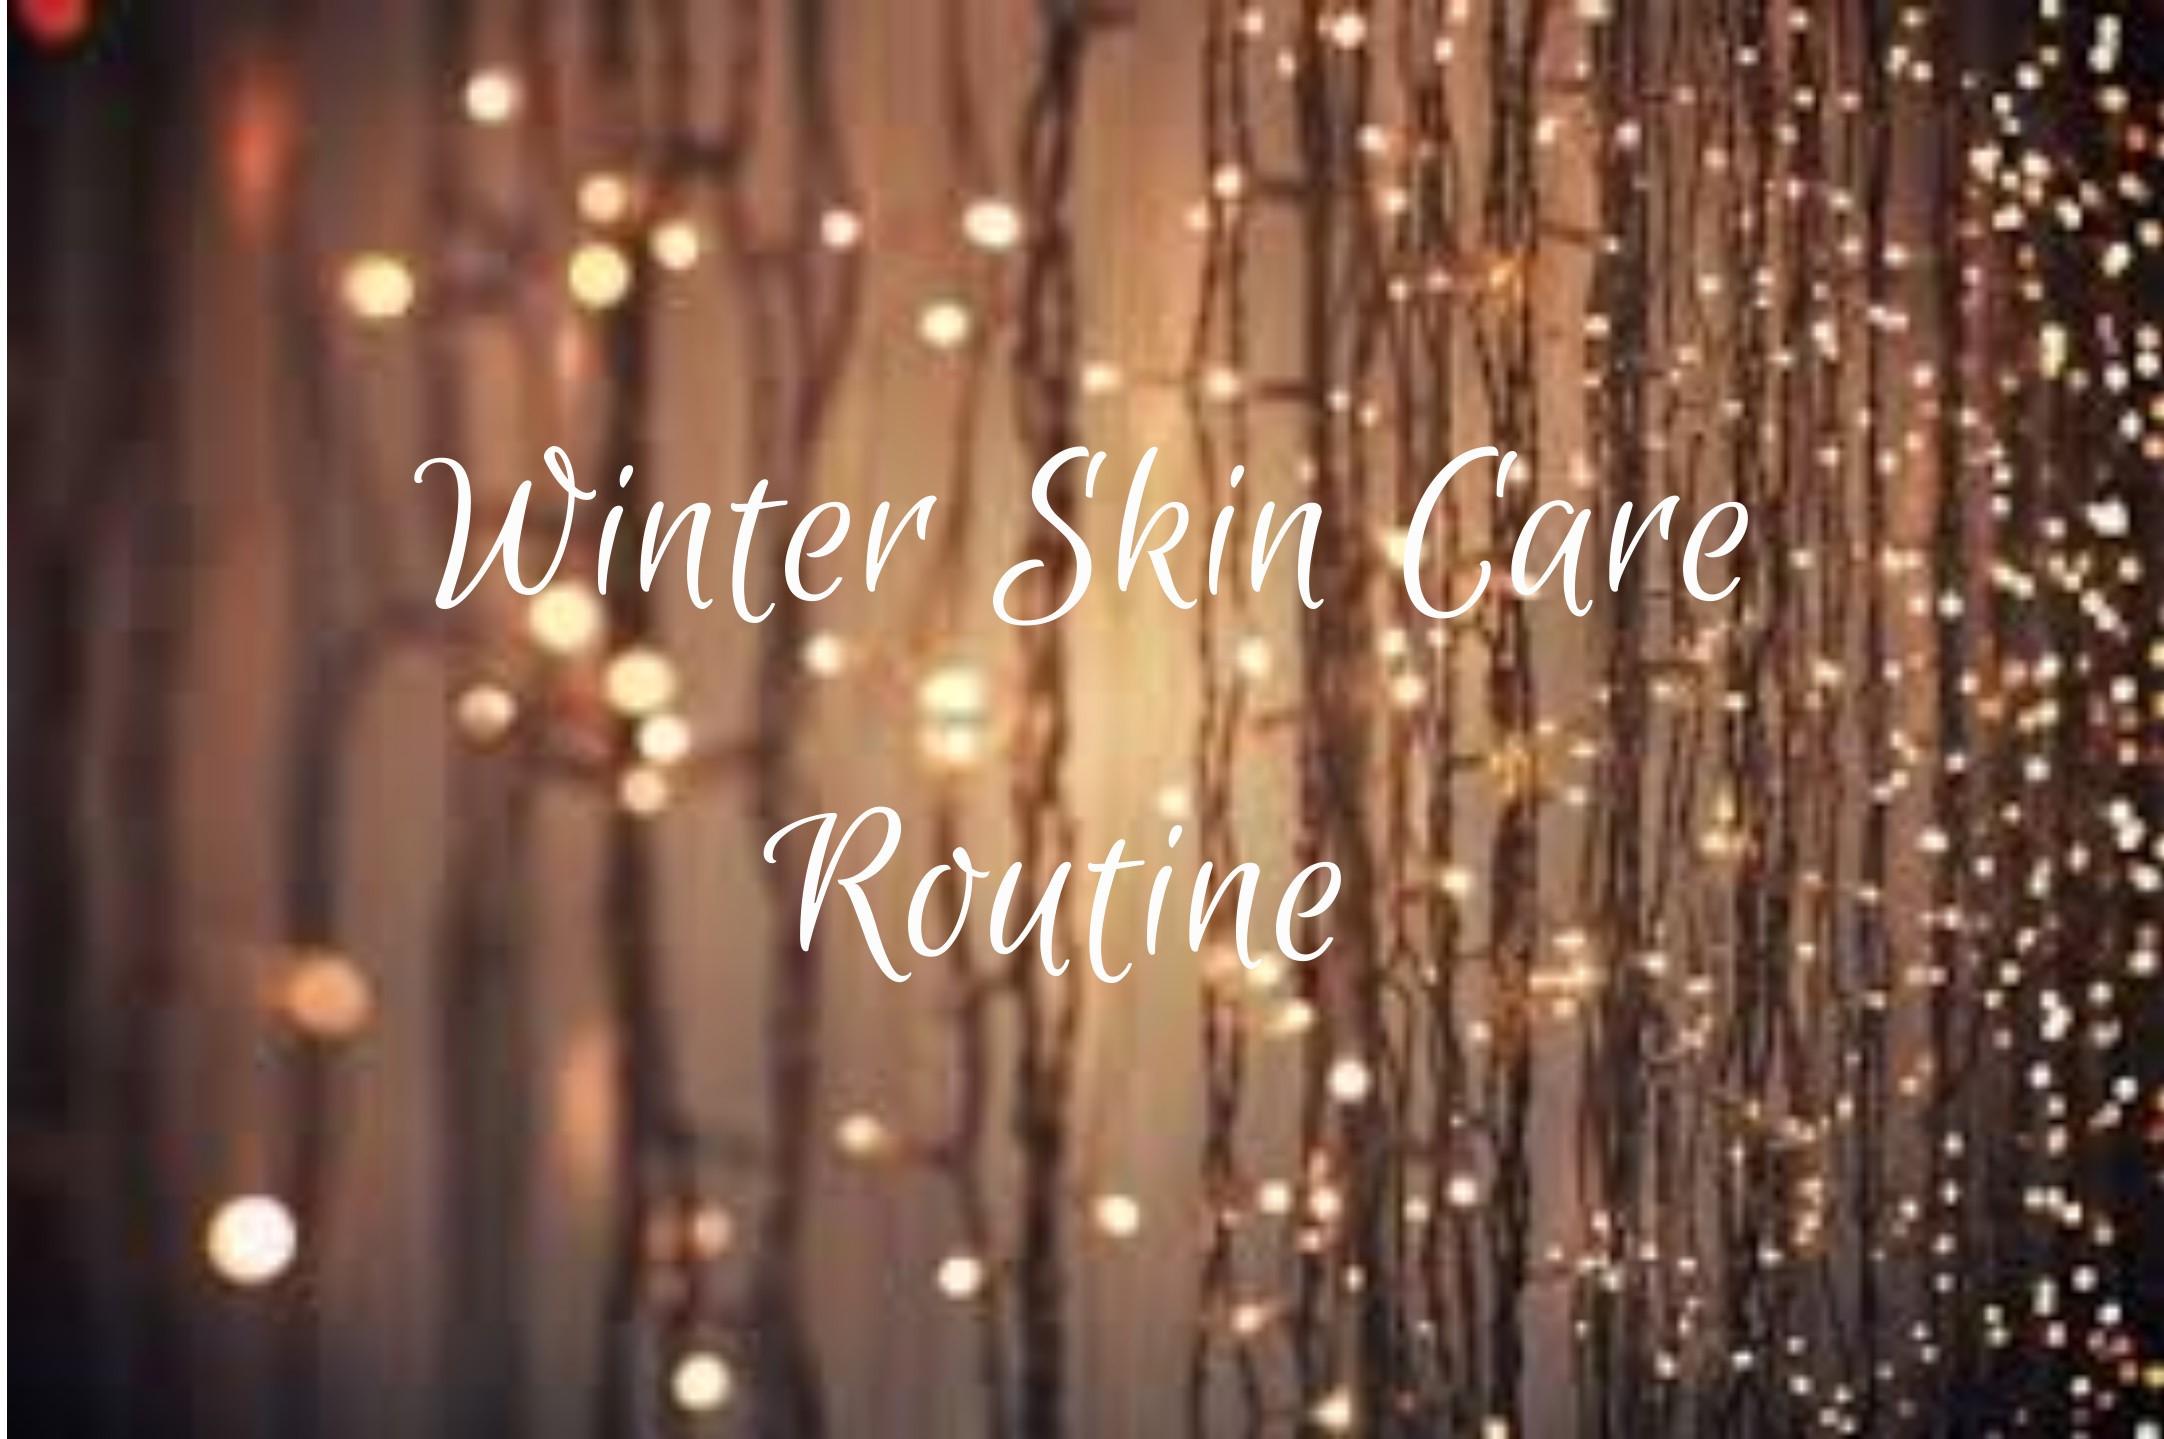 Winter-skin-care - Ari Wyant.jpg